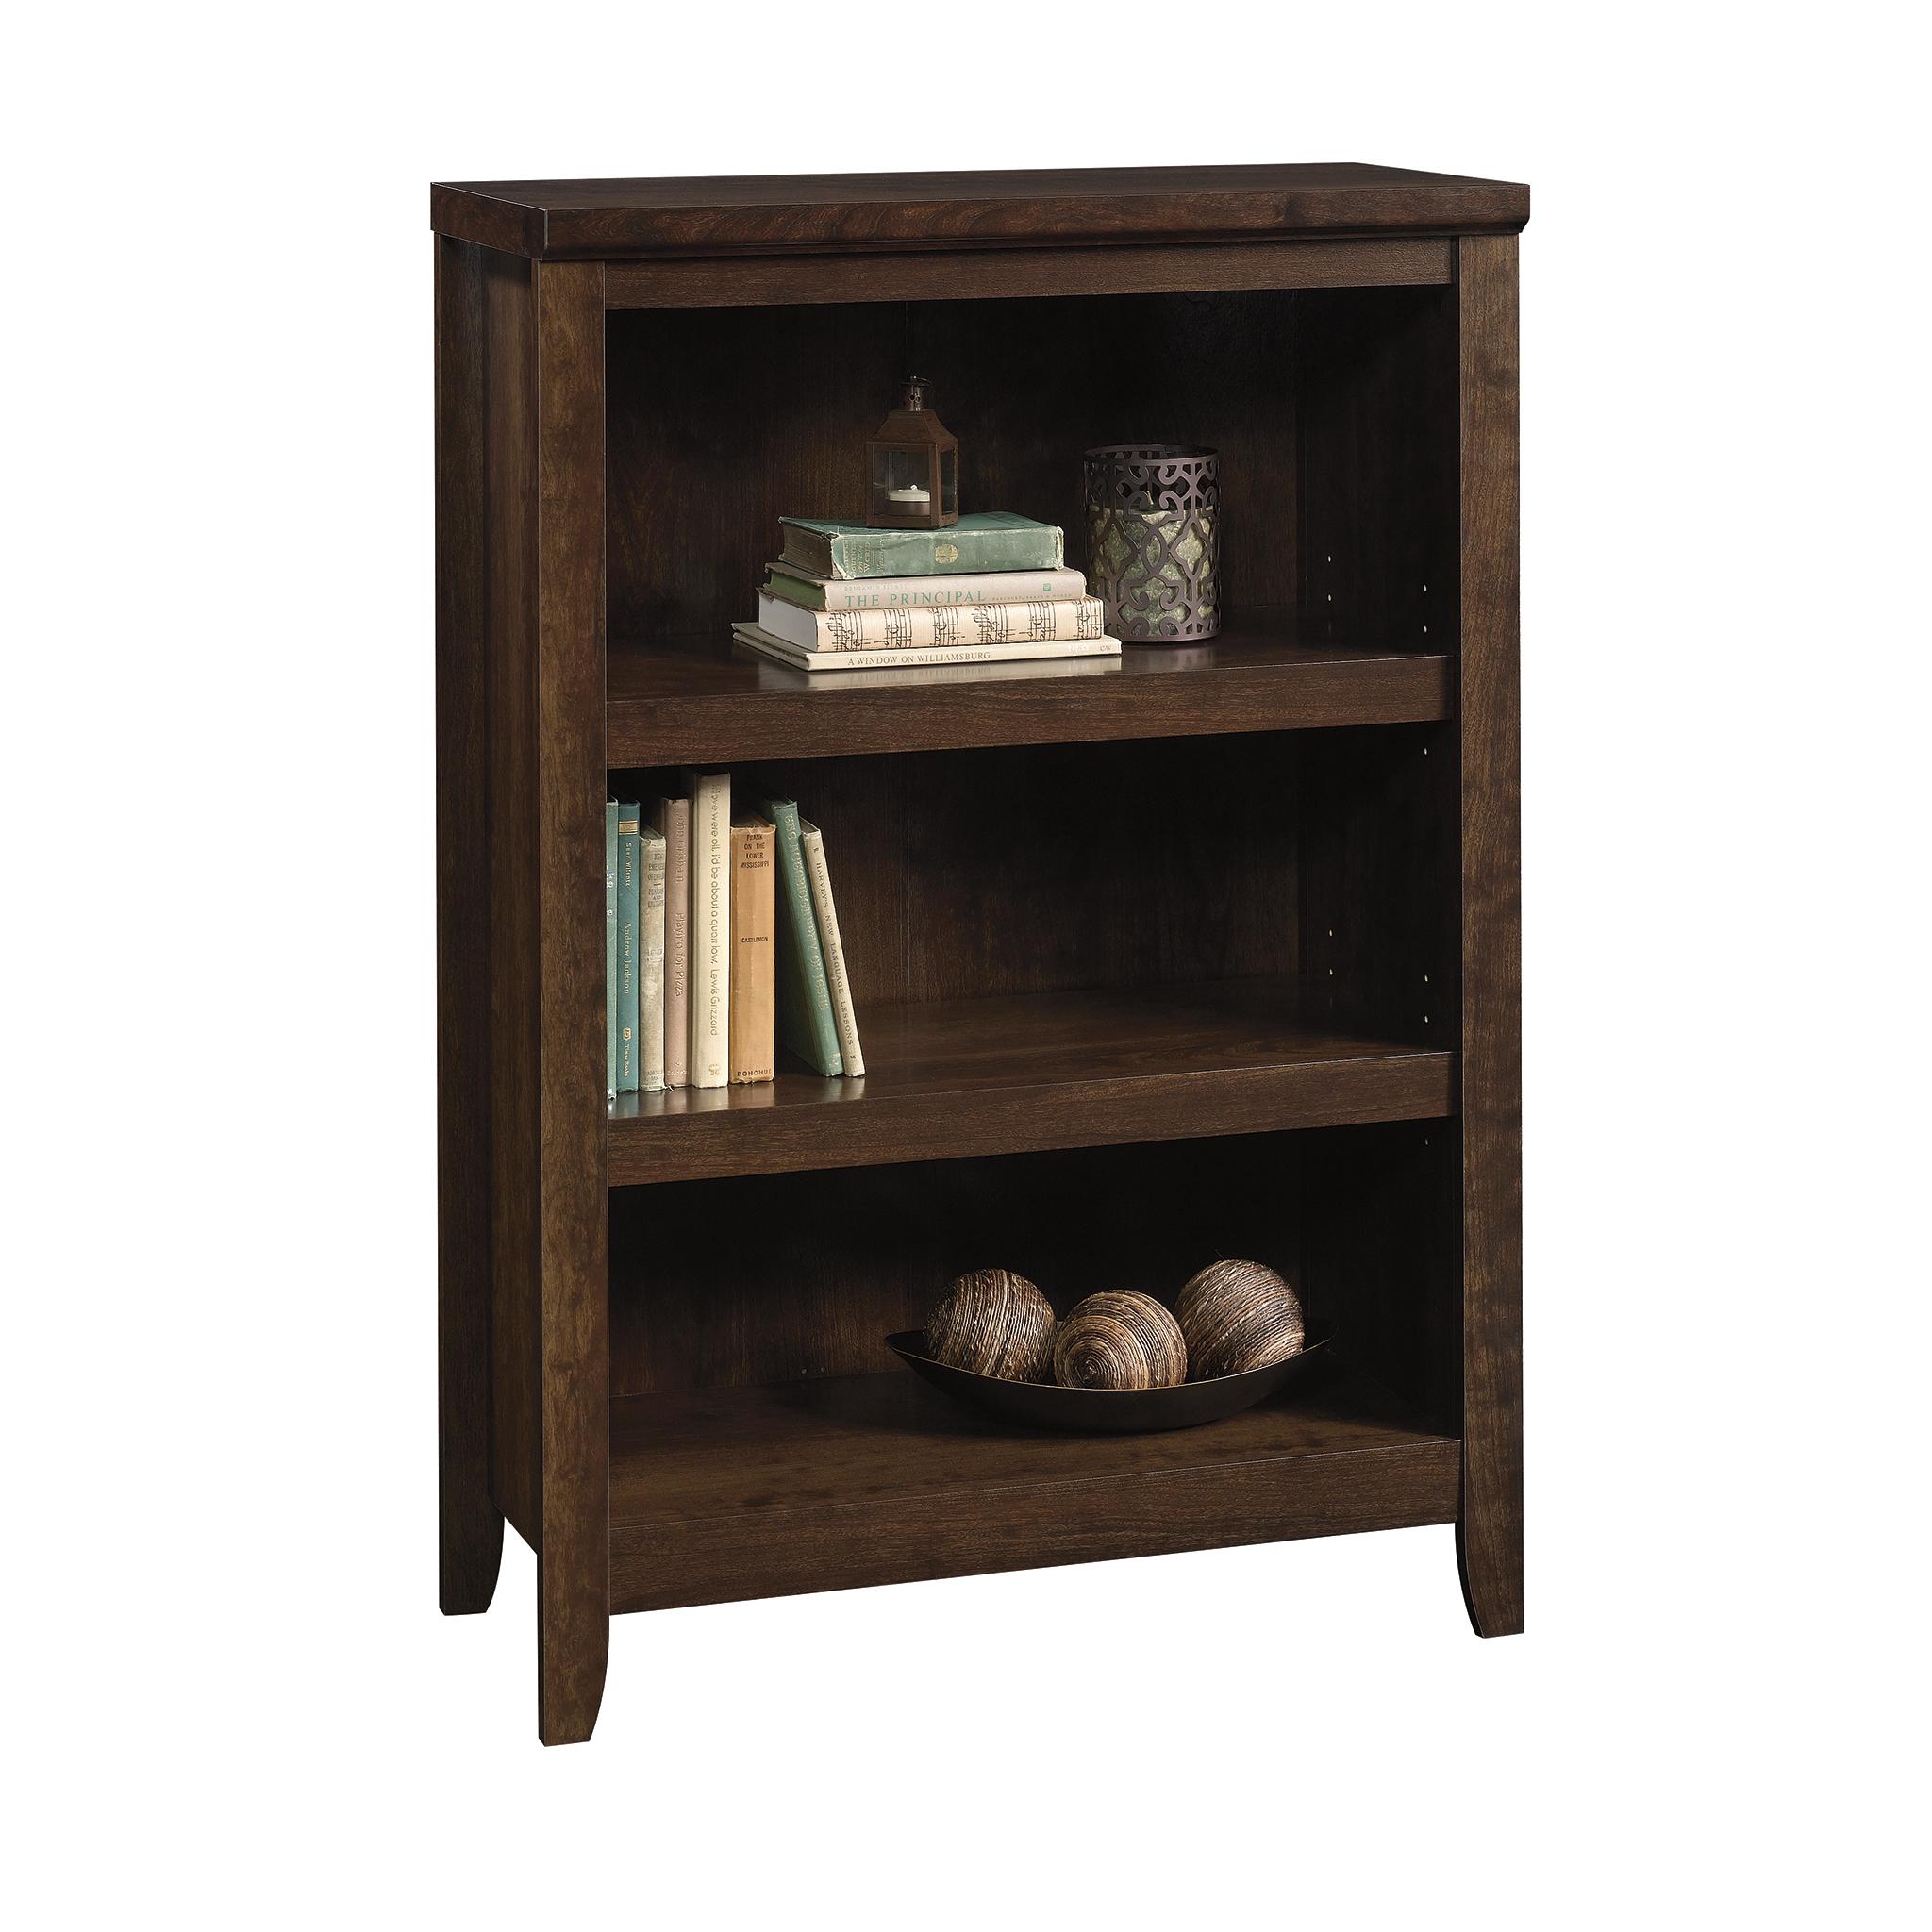 Better Homes & Gardens Parker 3 Shelf Bookcase, Estate Toffee Finish